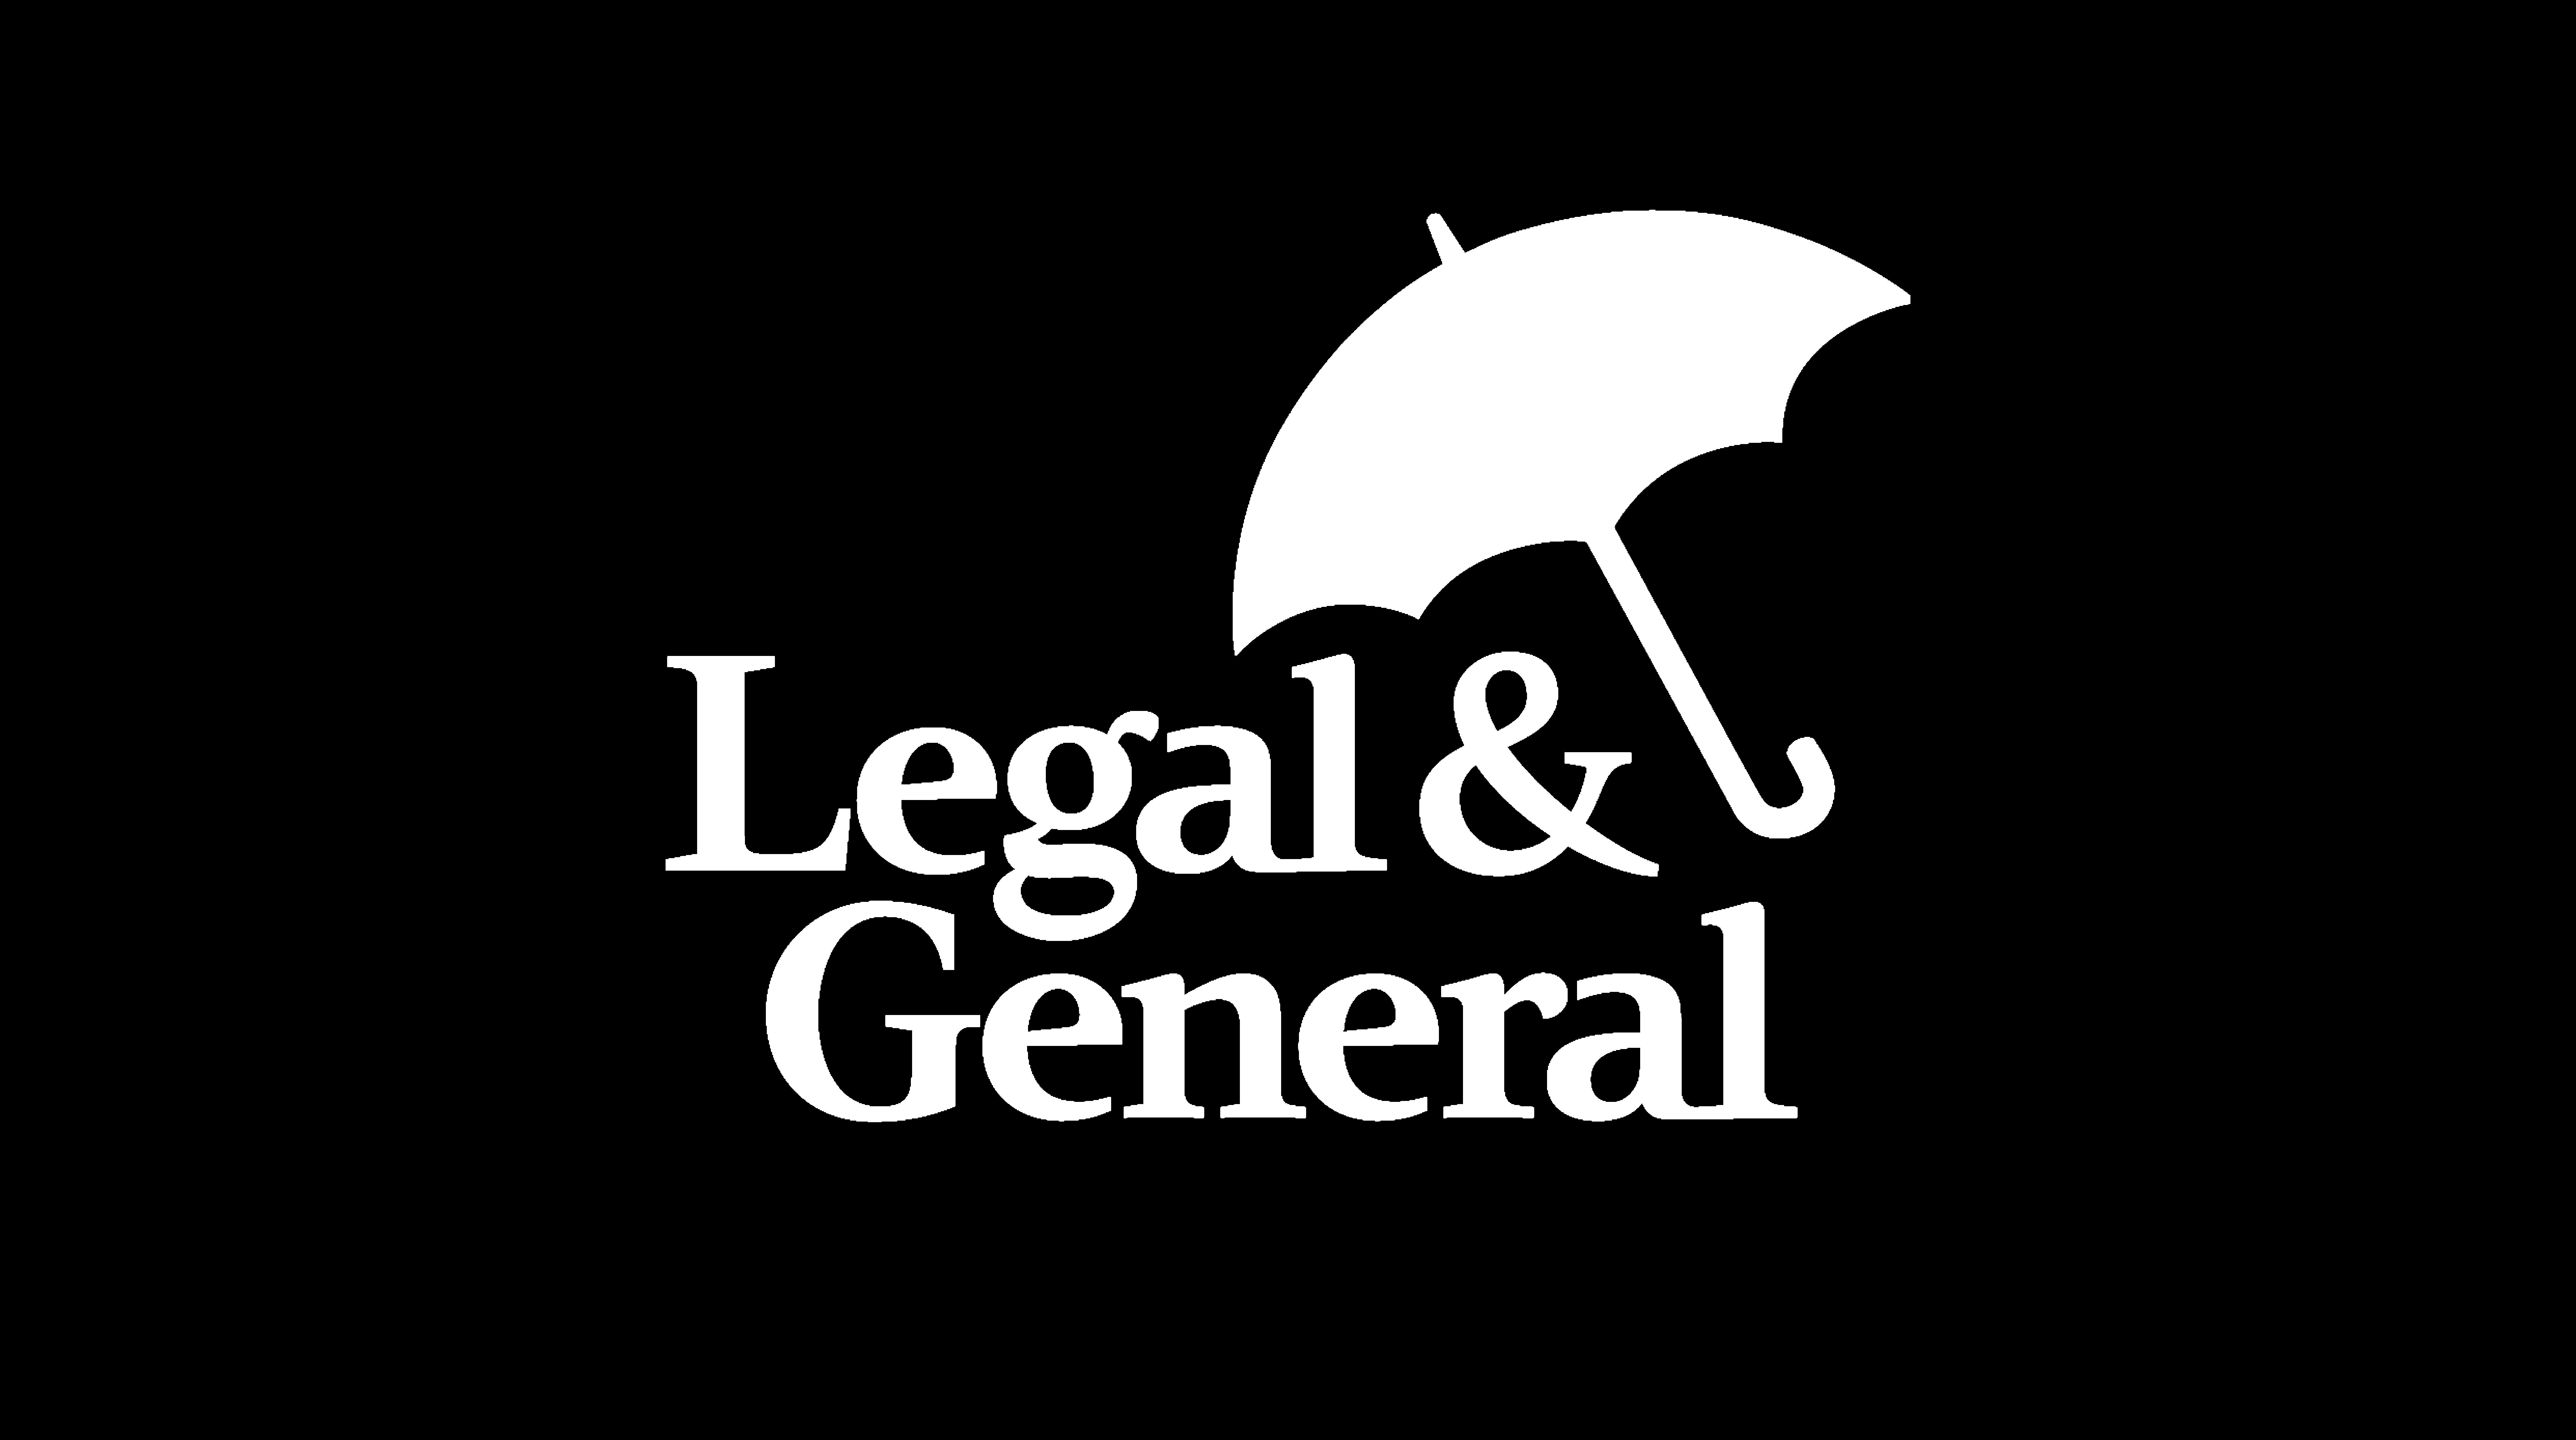 legal & general logo white